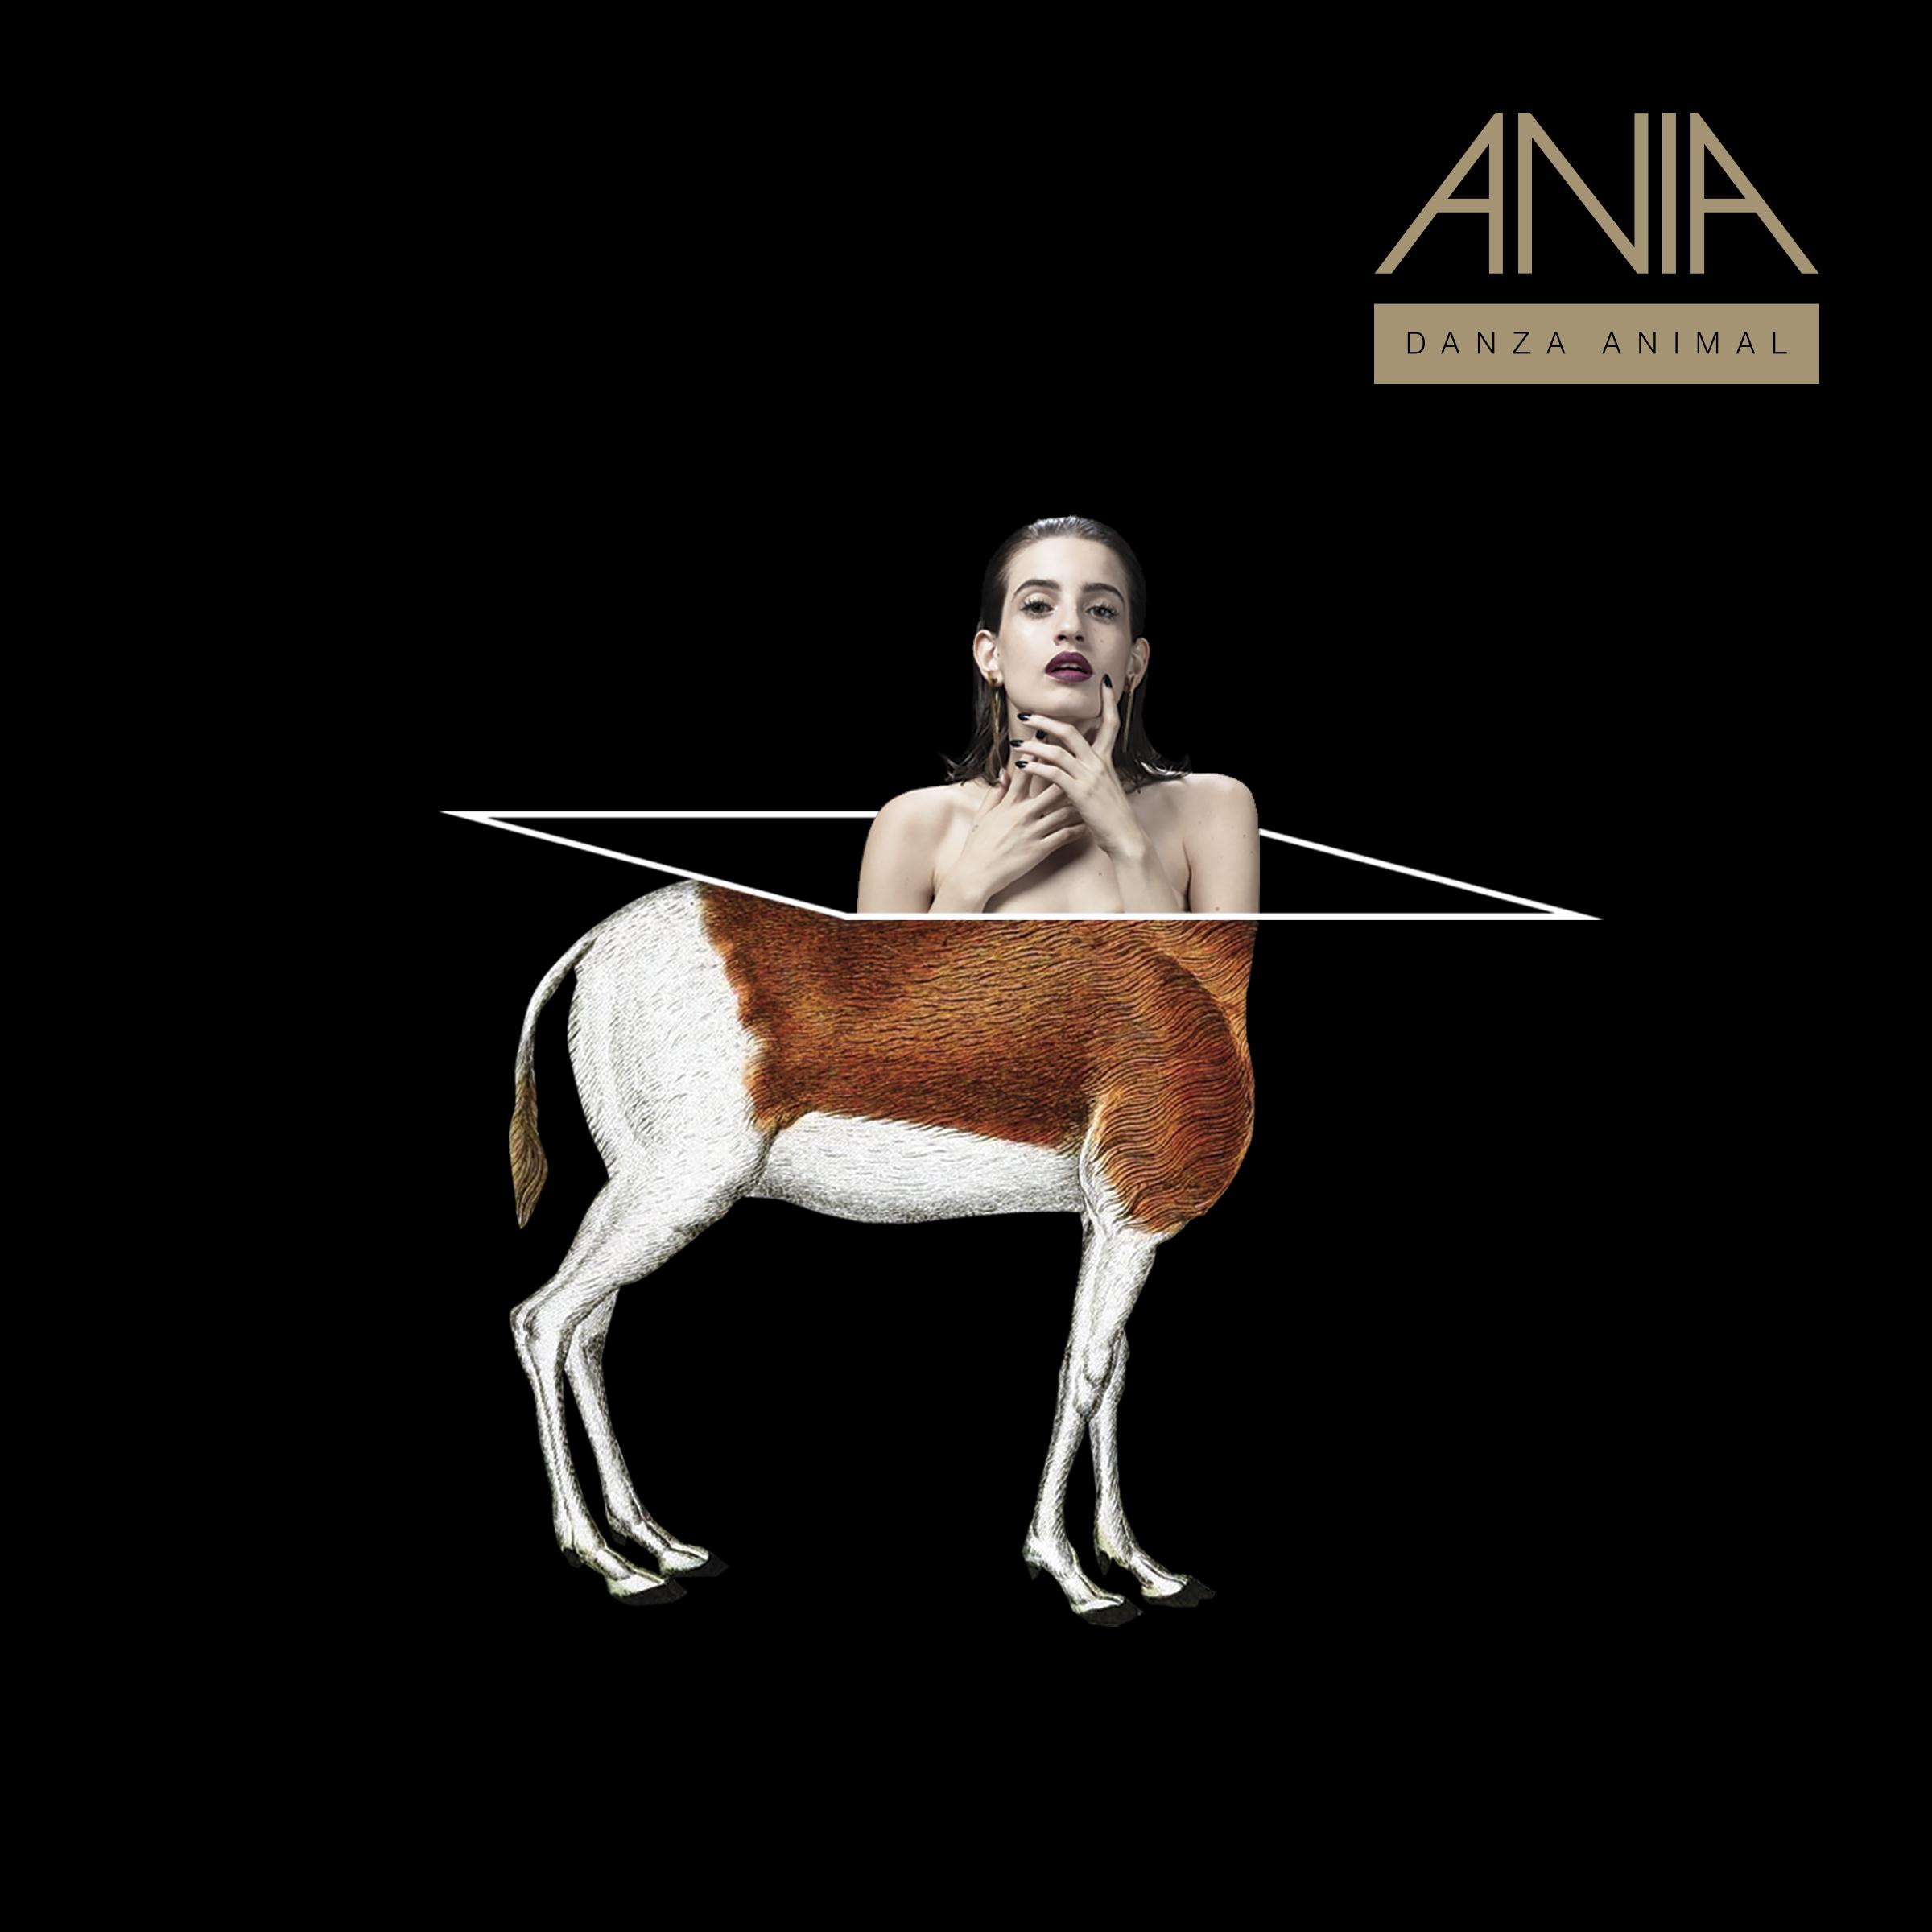 ania-danzaanimal